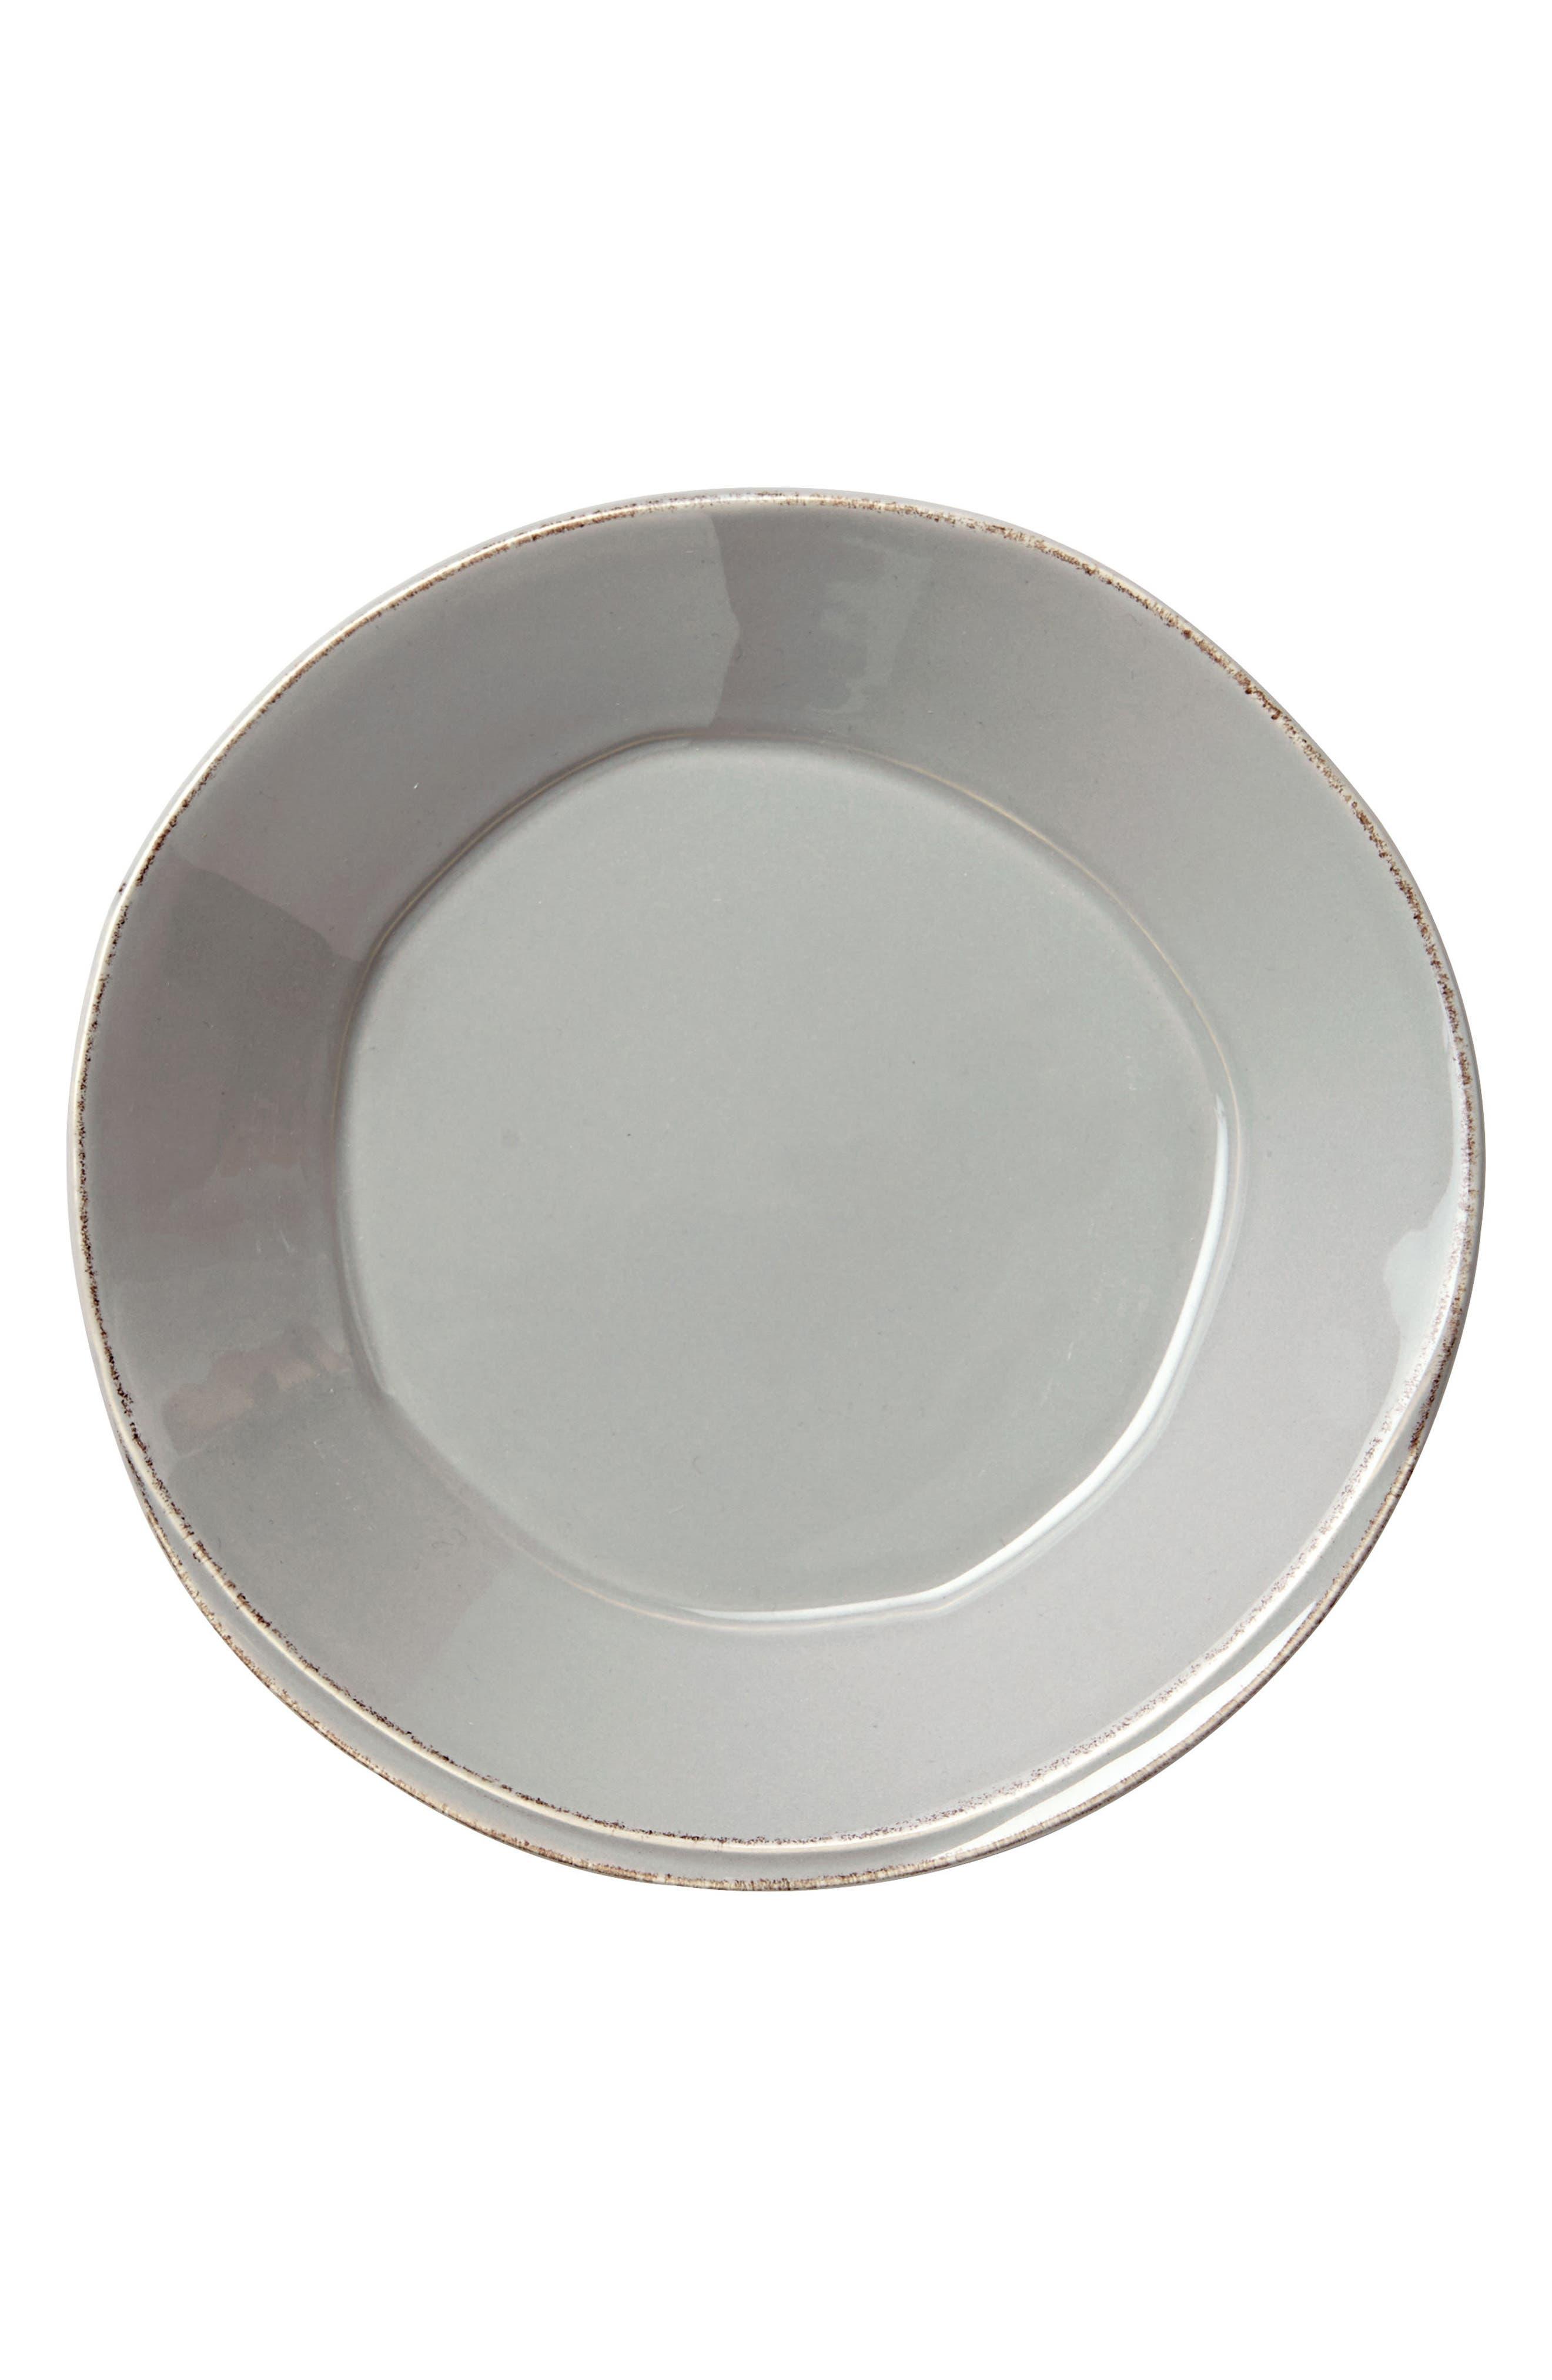 VIETRA Lastra Pasta Bowl,                             Main thumbnail 1, color,                             Gray